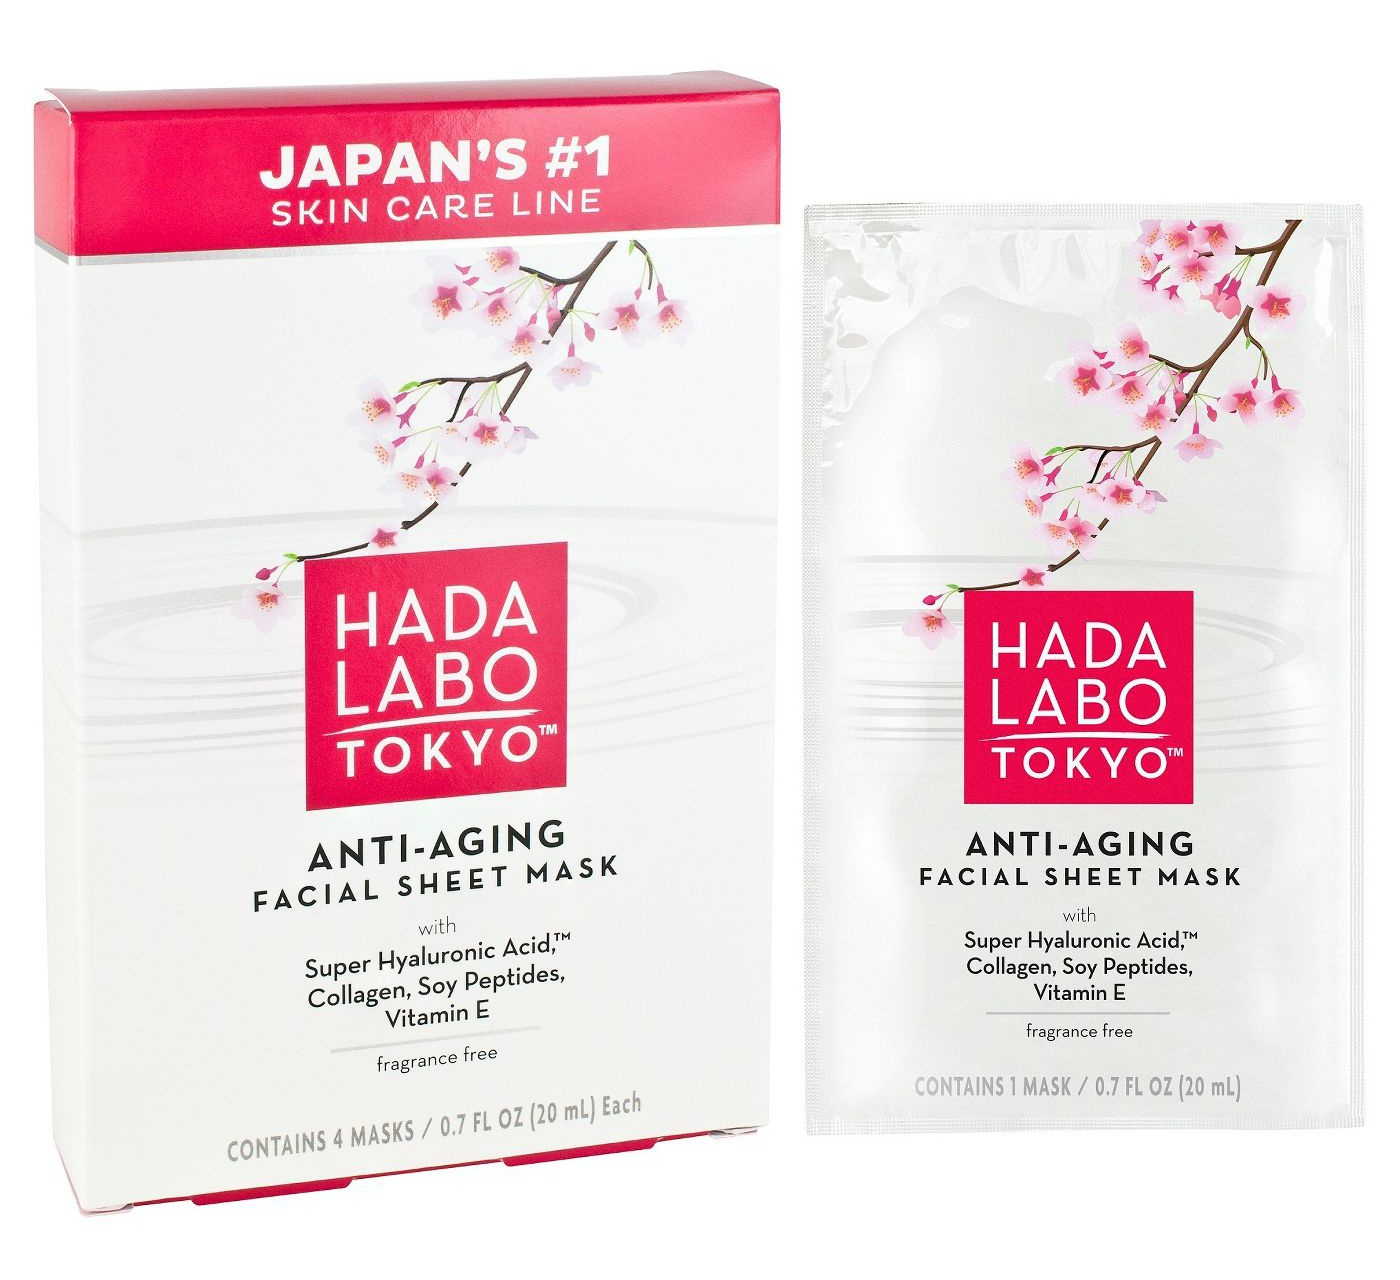 Hada Labo Unscented Hada Labo Tokyo Anti-Aging Face Mask